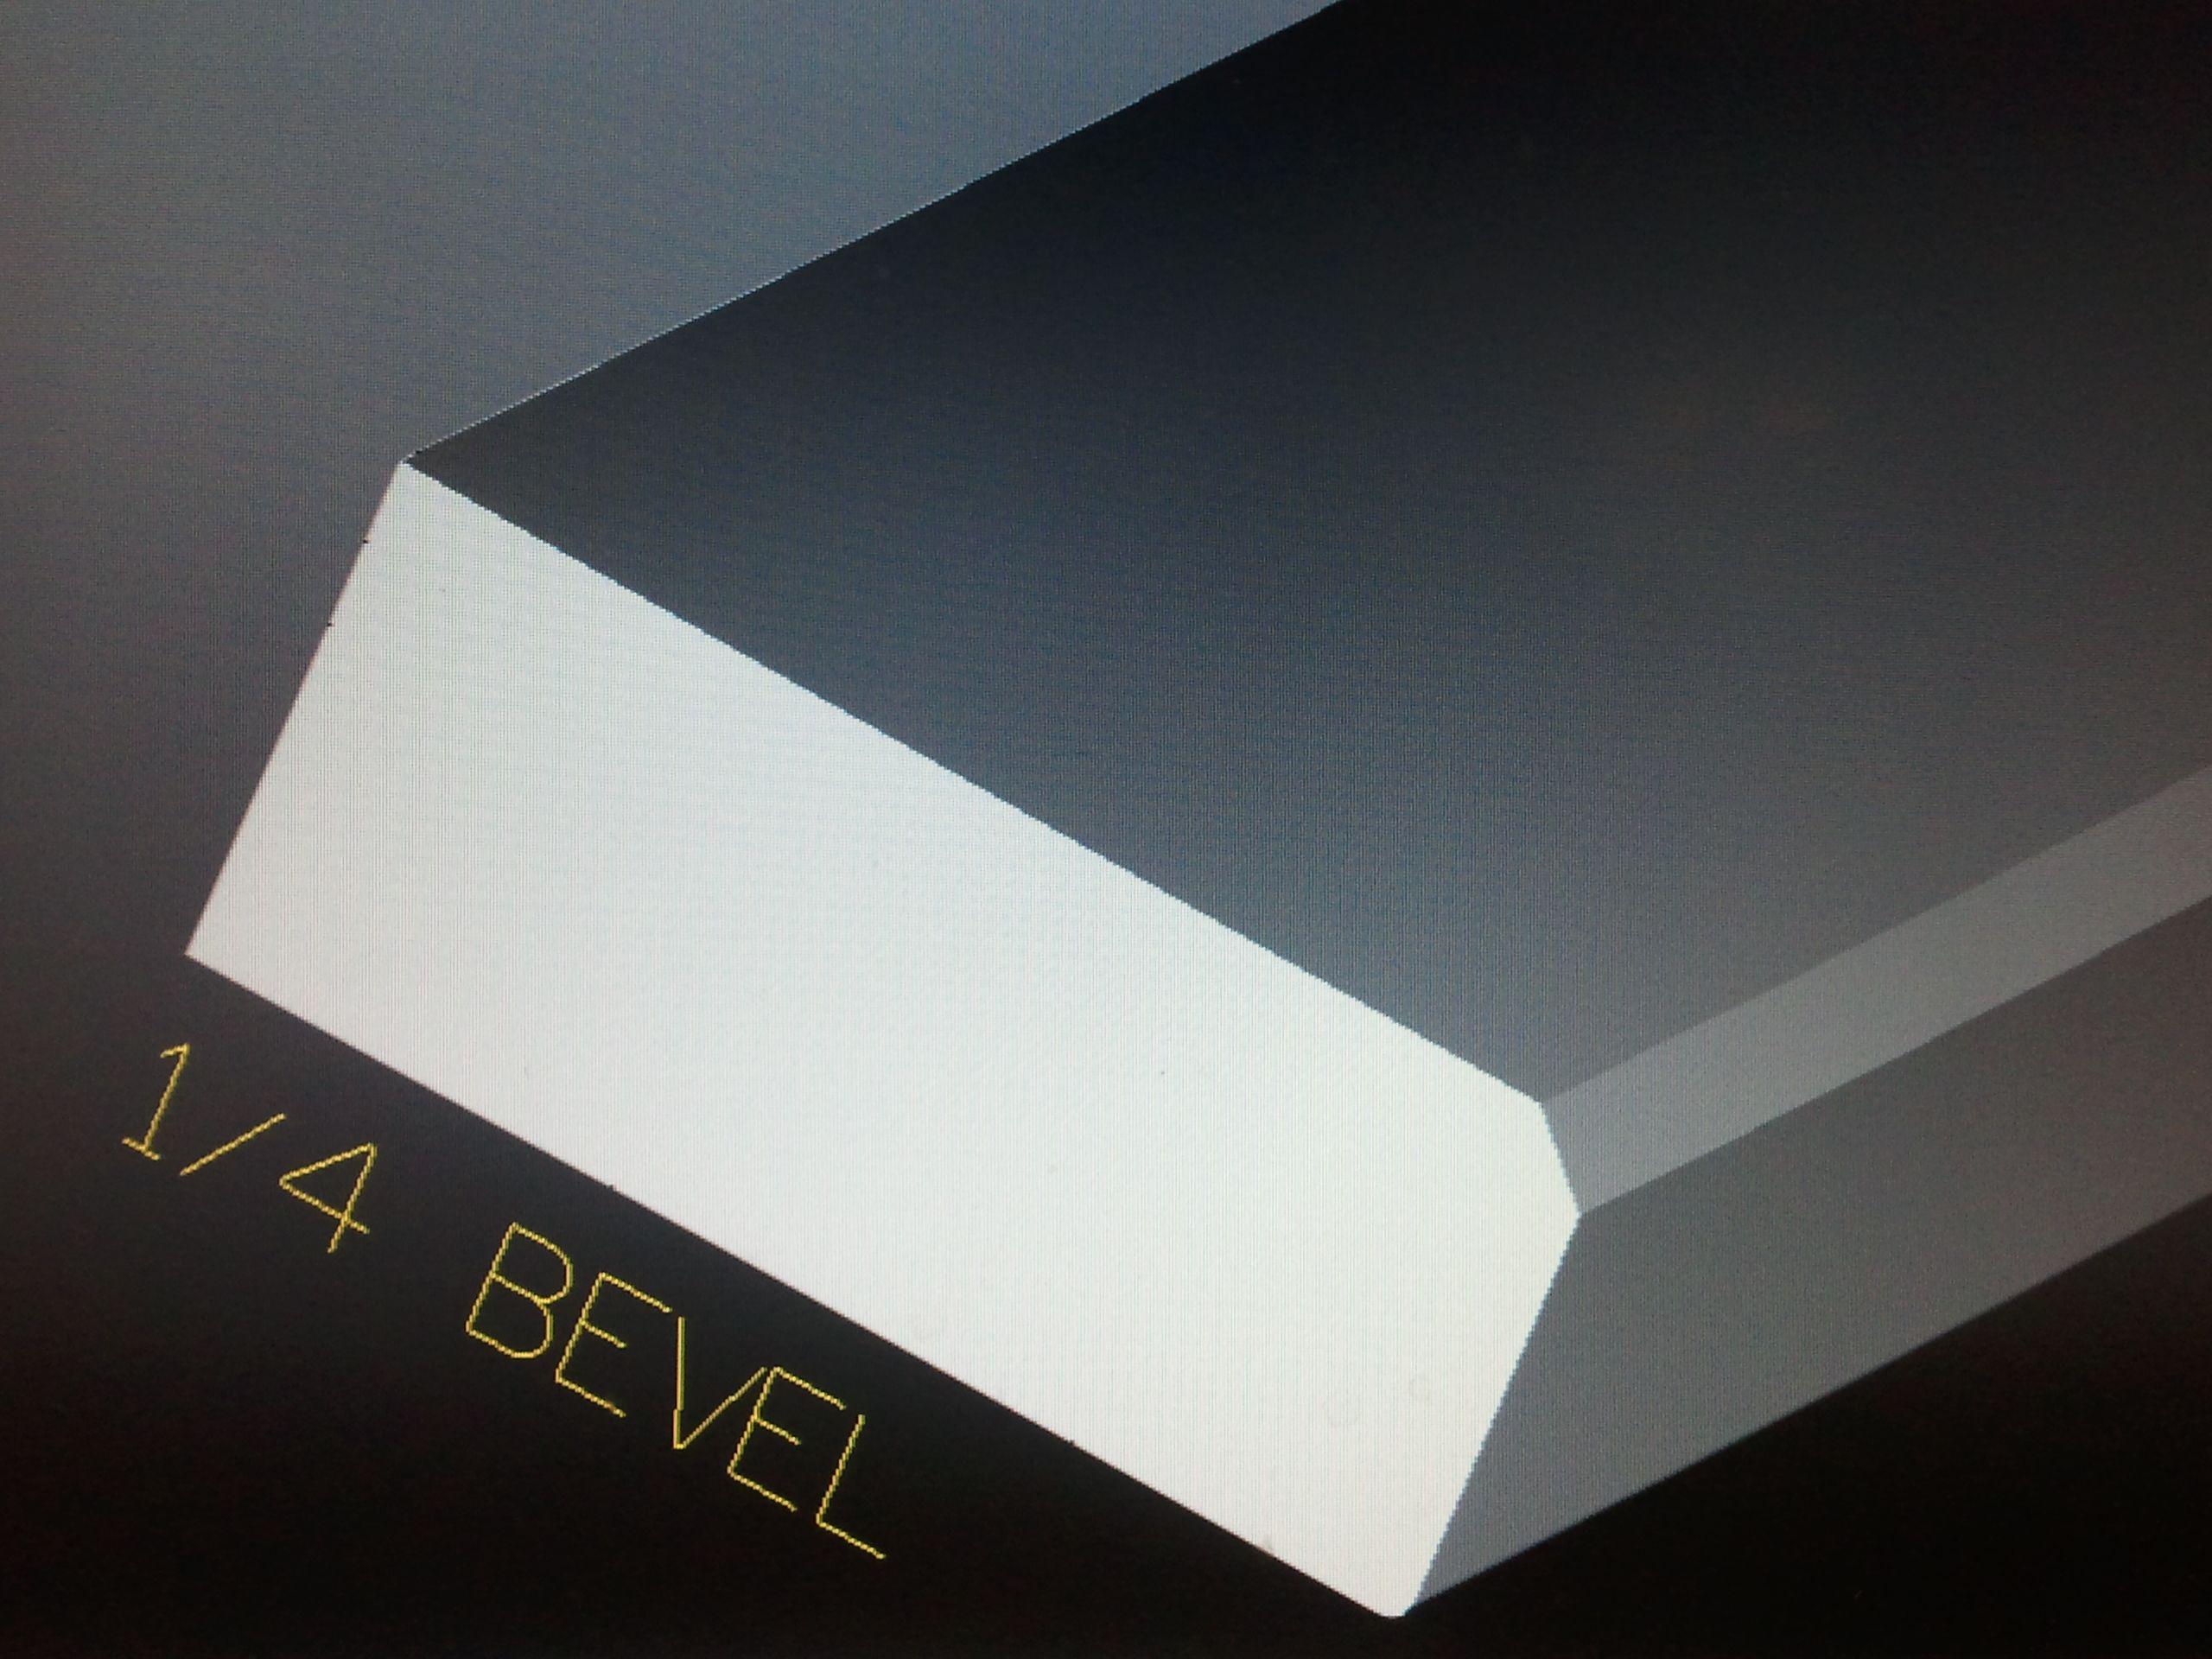 1 4 Bevel Edge Beveled Edge Edge Profile Bevel